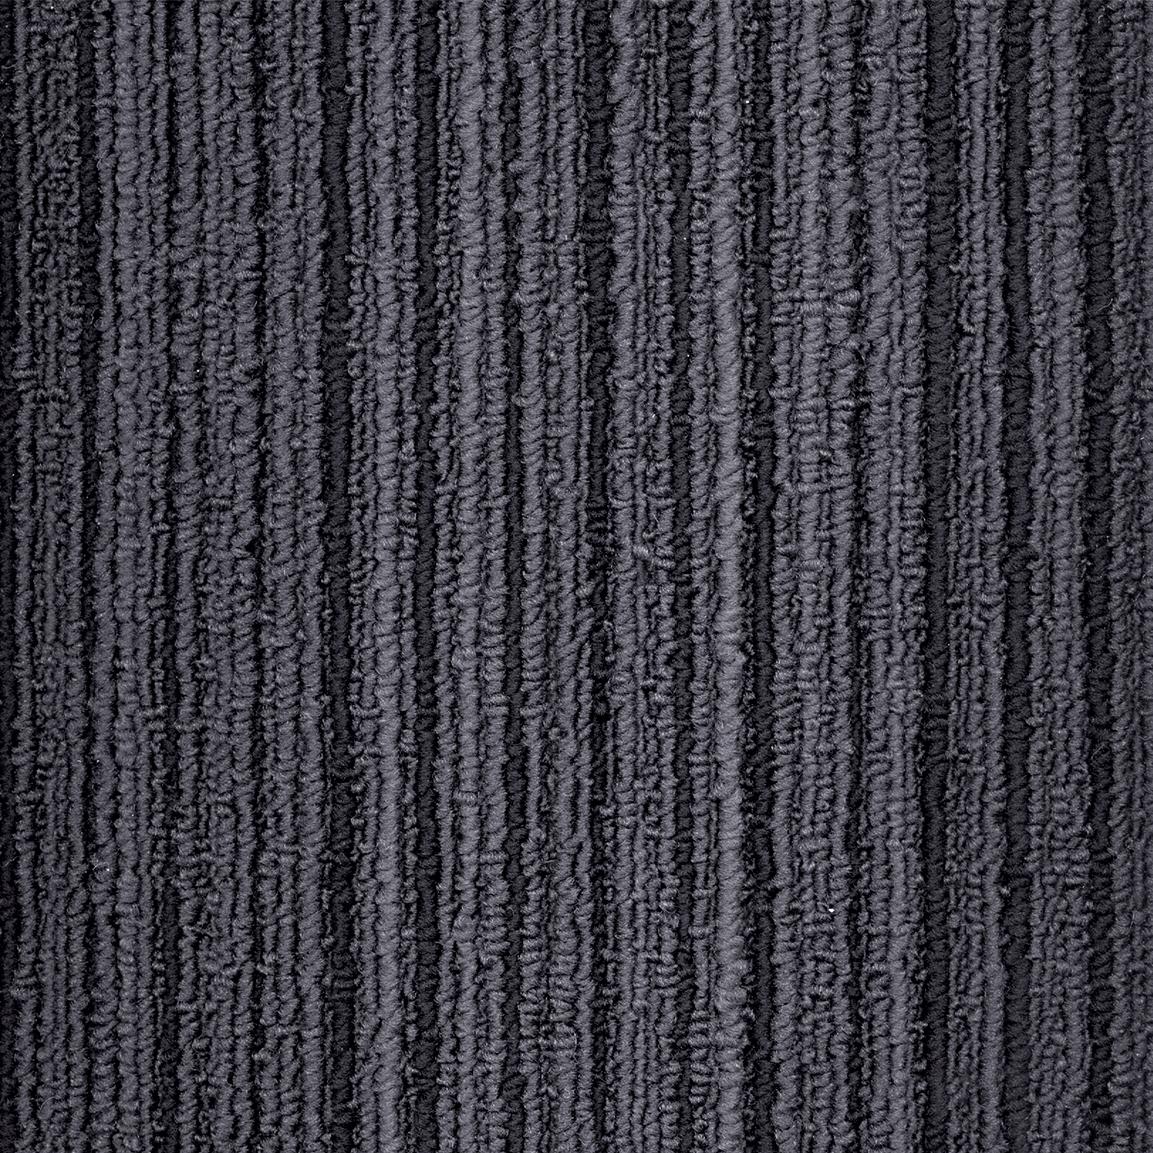 Taurus Amethyst | Loop Pile, Polypropylene Carpet Tiles